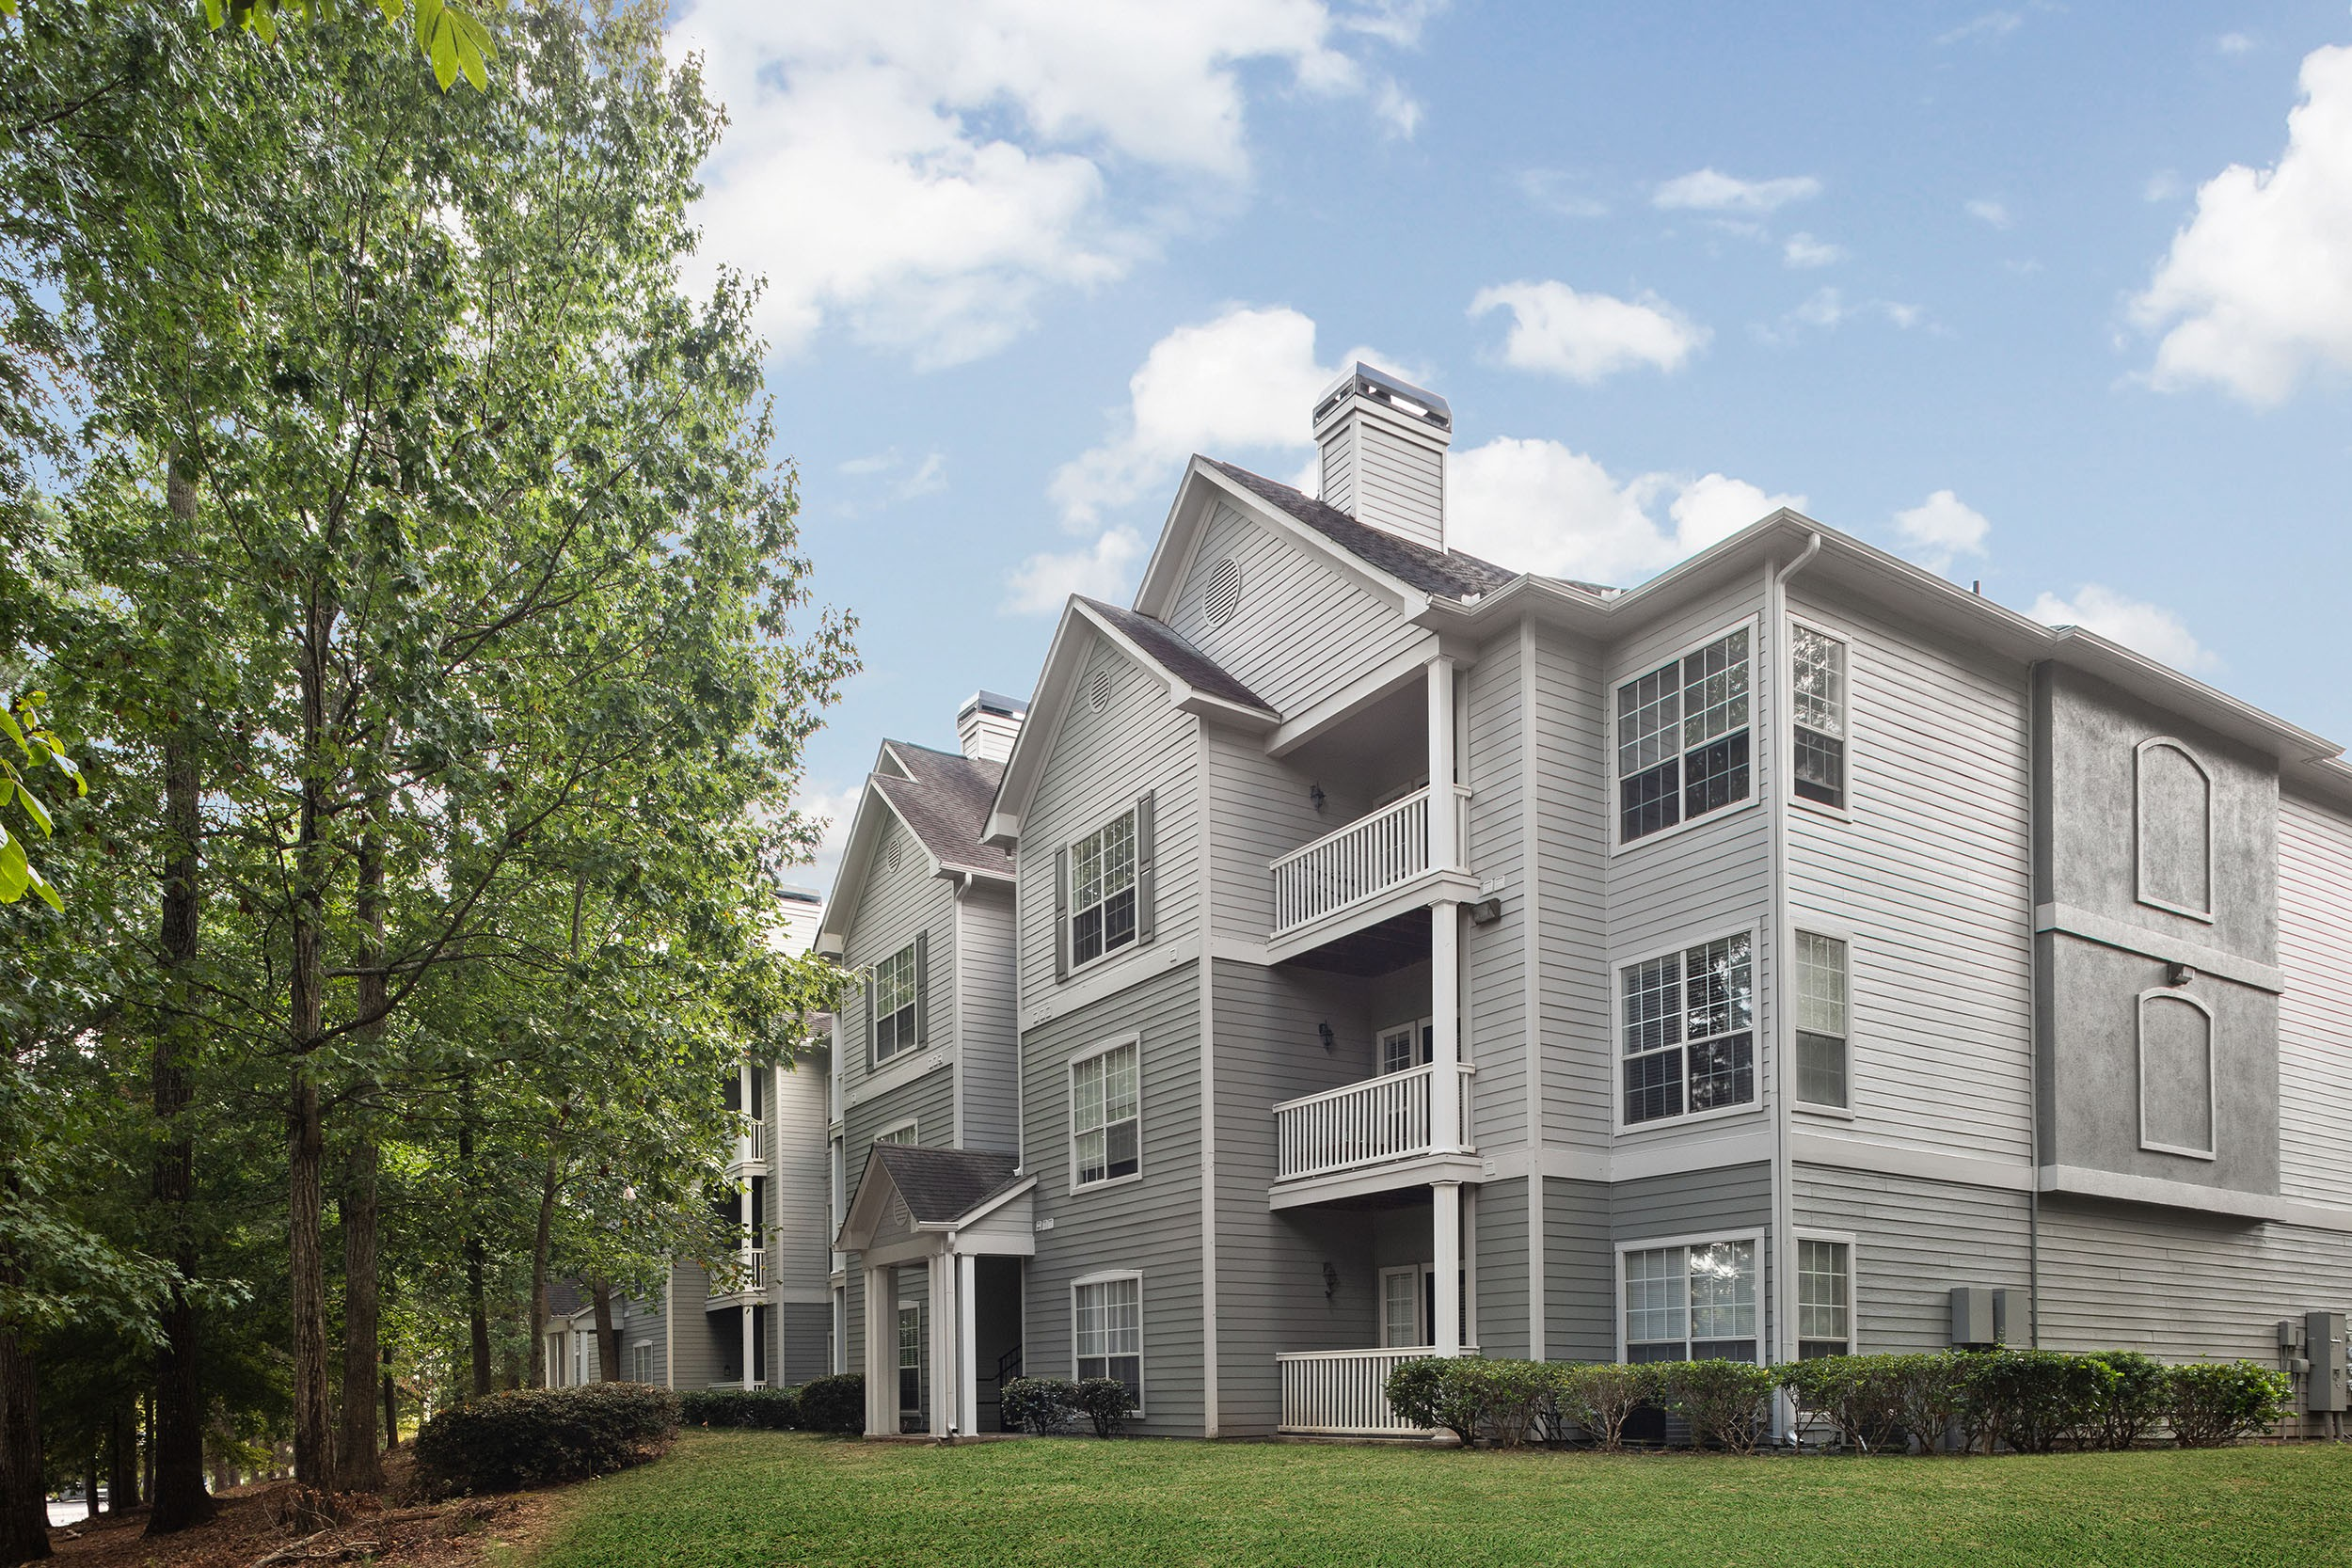 Creekside Corners Apartment Homes